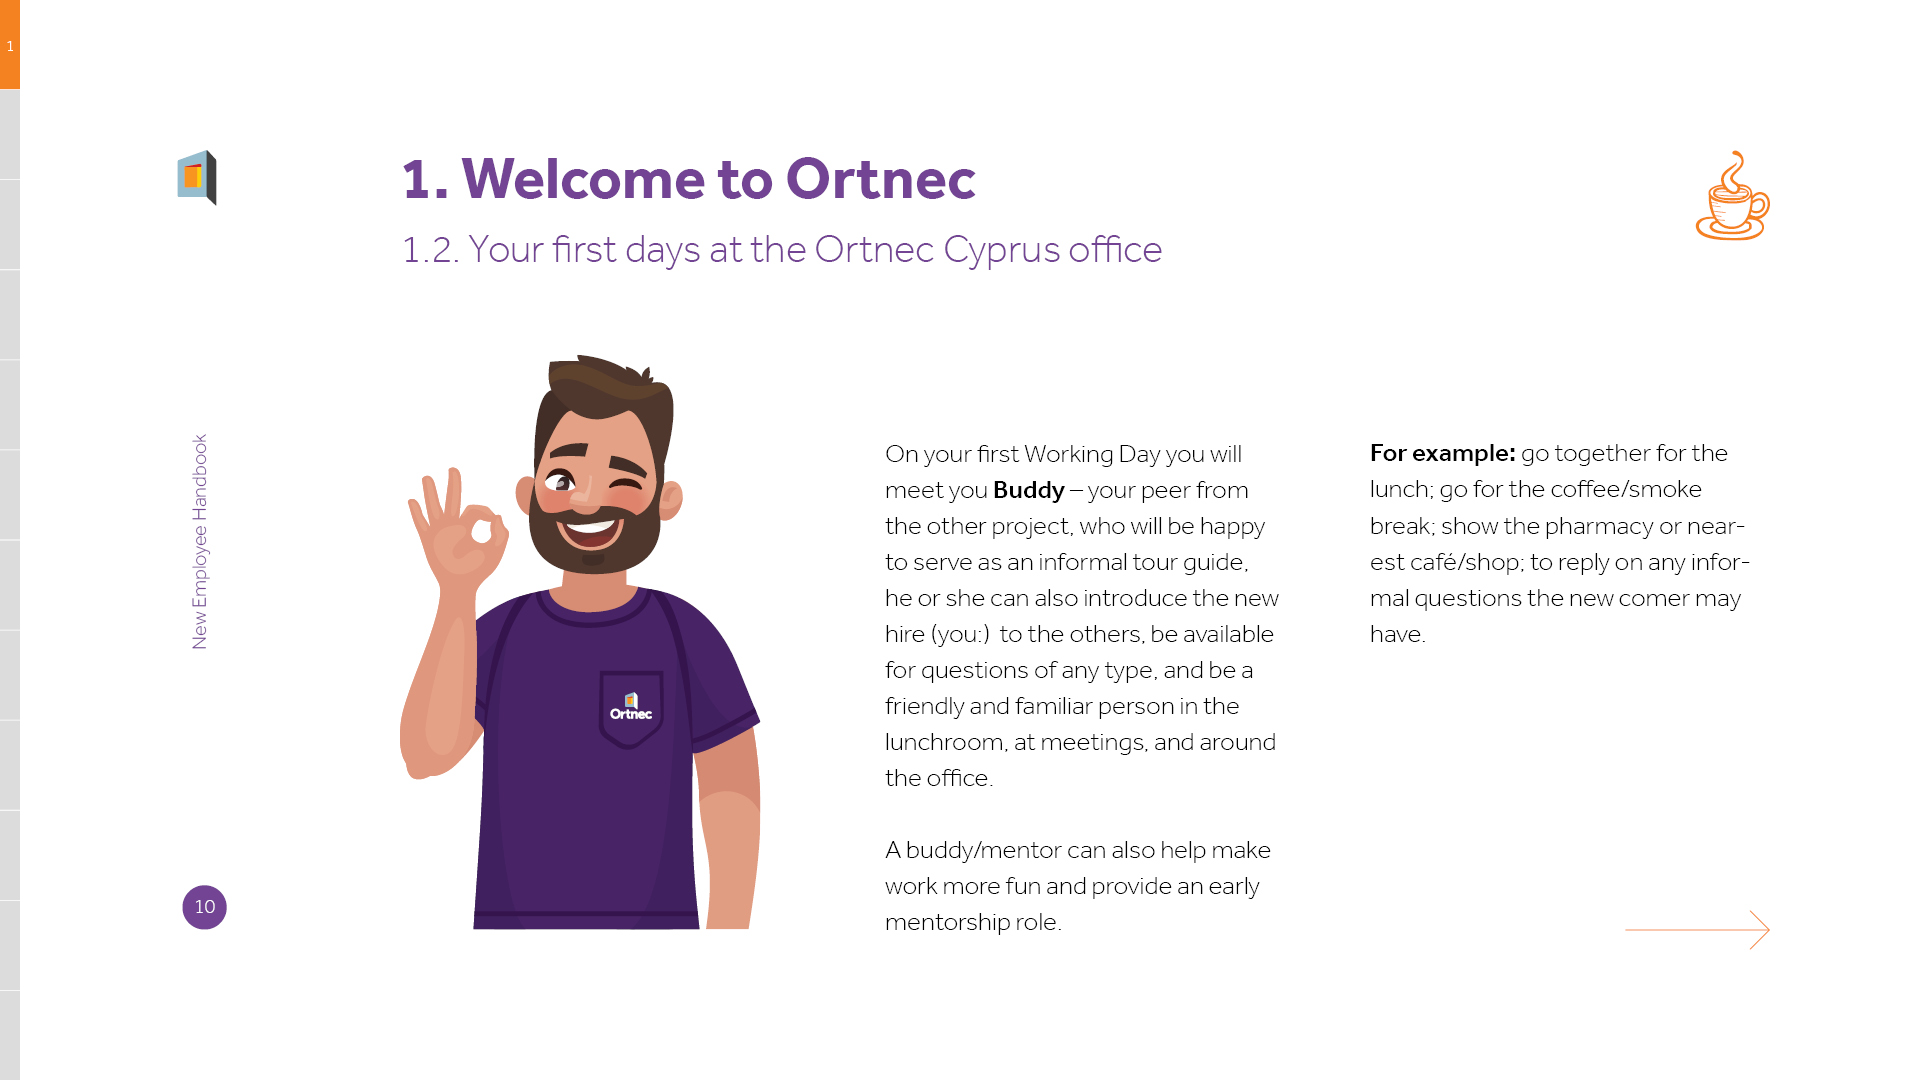 Ortnec_Employee_Handbook_201810